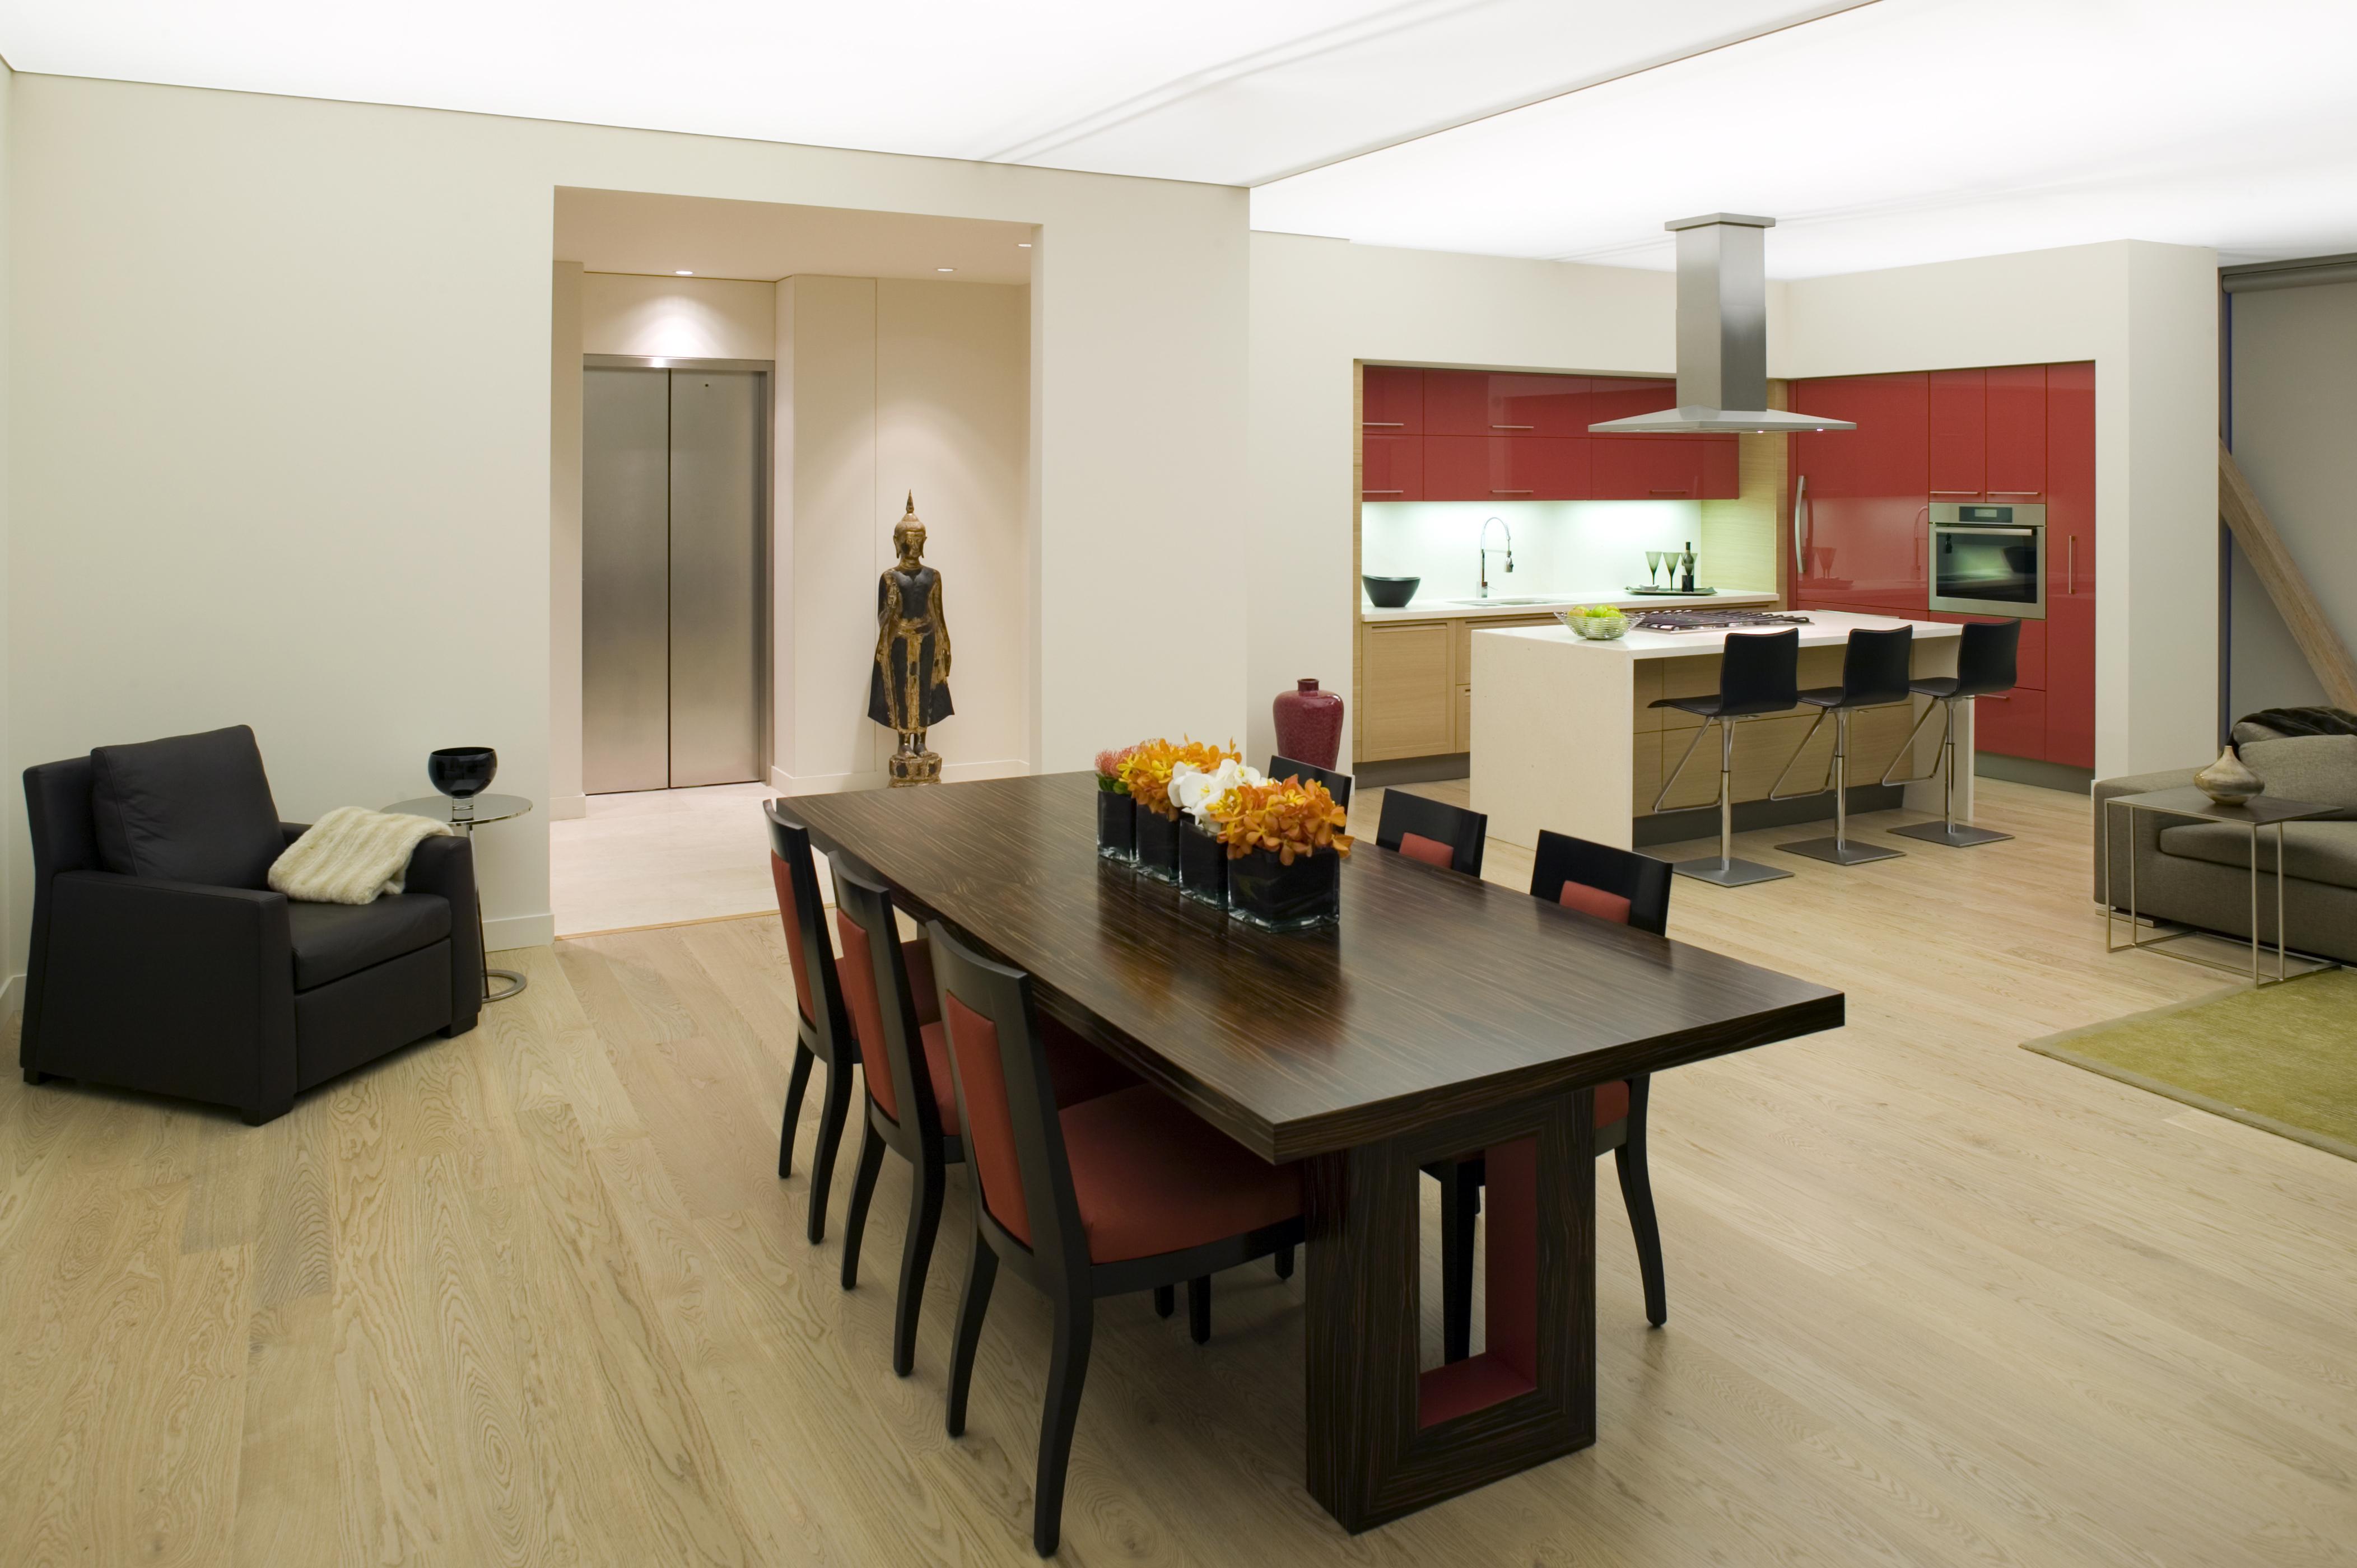 penthouse condominium kitchen